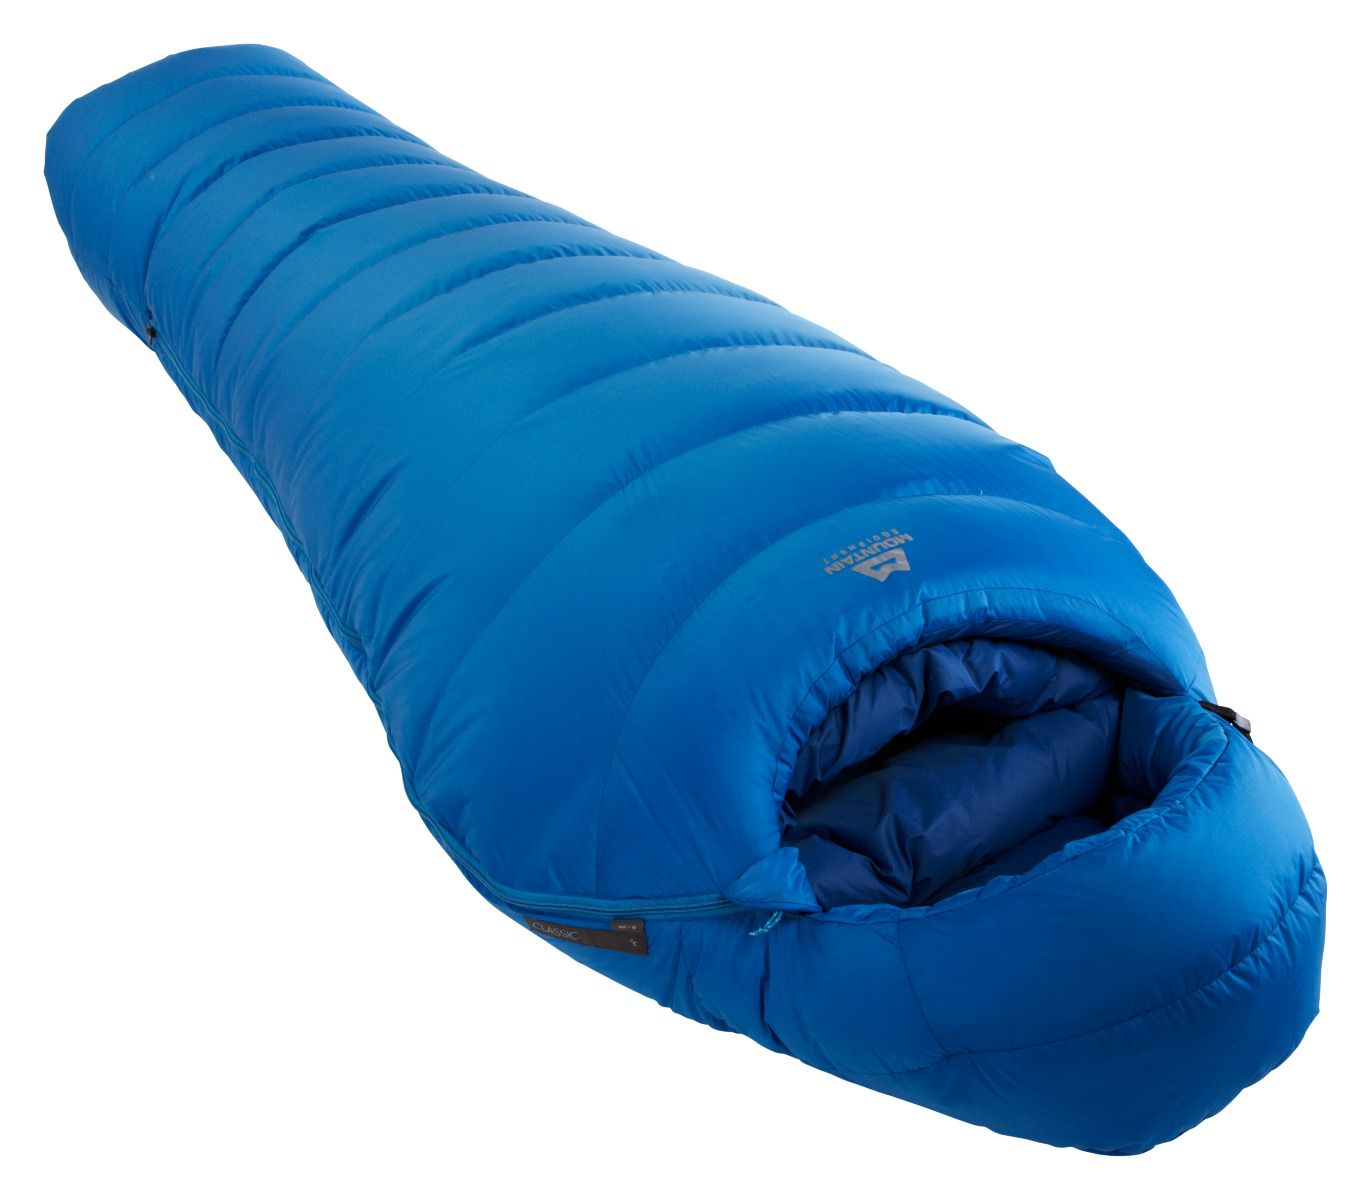 Mountain Equipment Classic 1000 - péřový spacák Barva: skydiver, délka: regular, Zip: pravý + prodloužená záruka